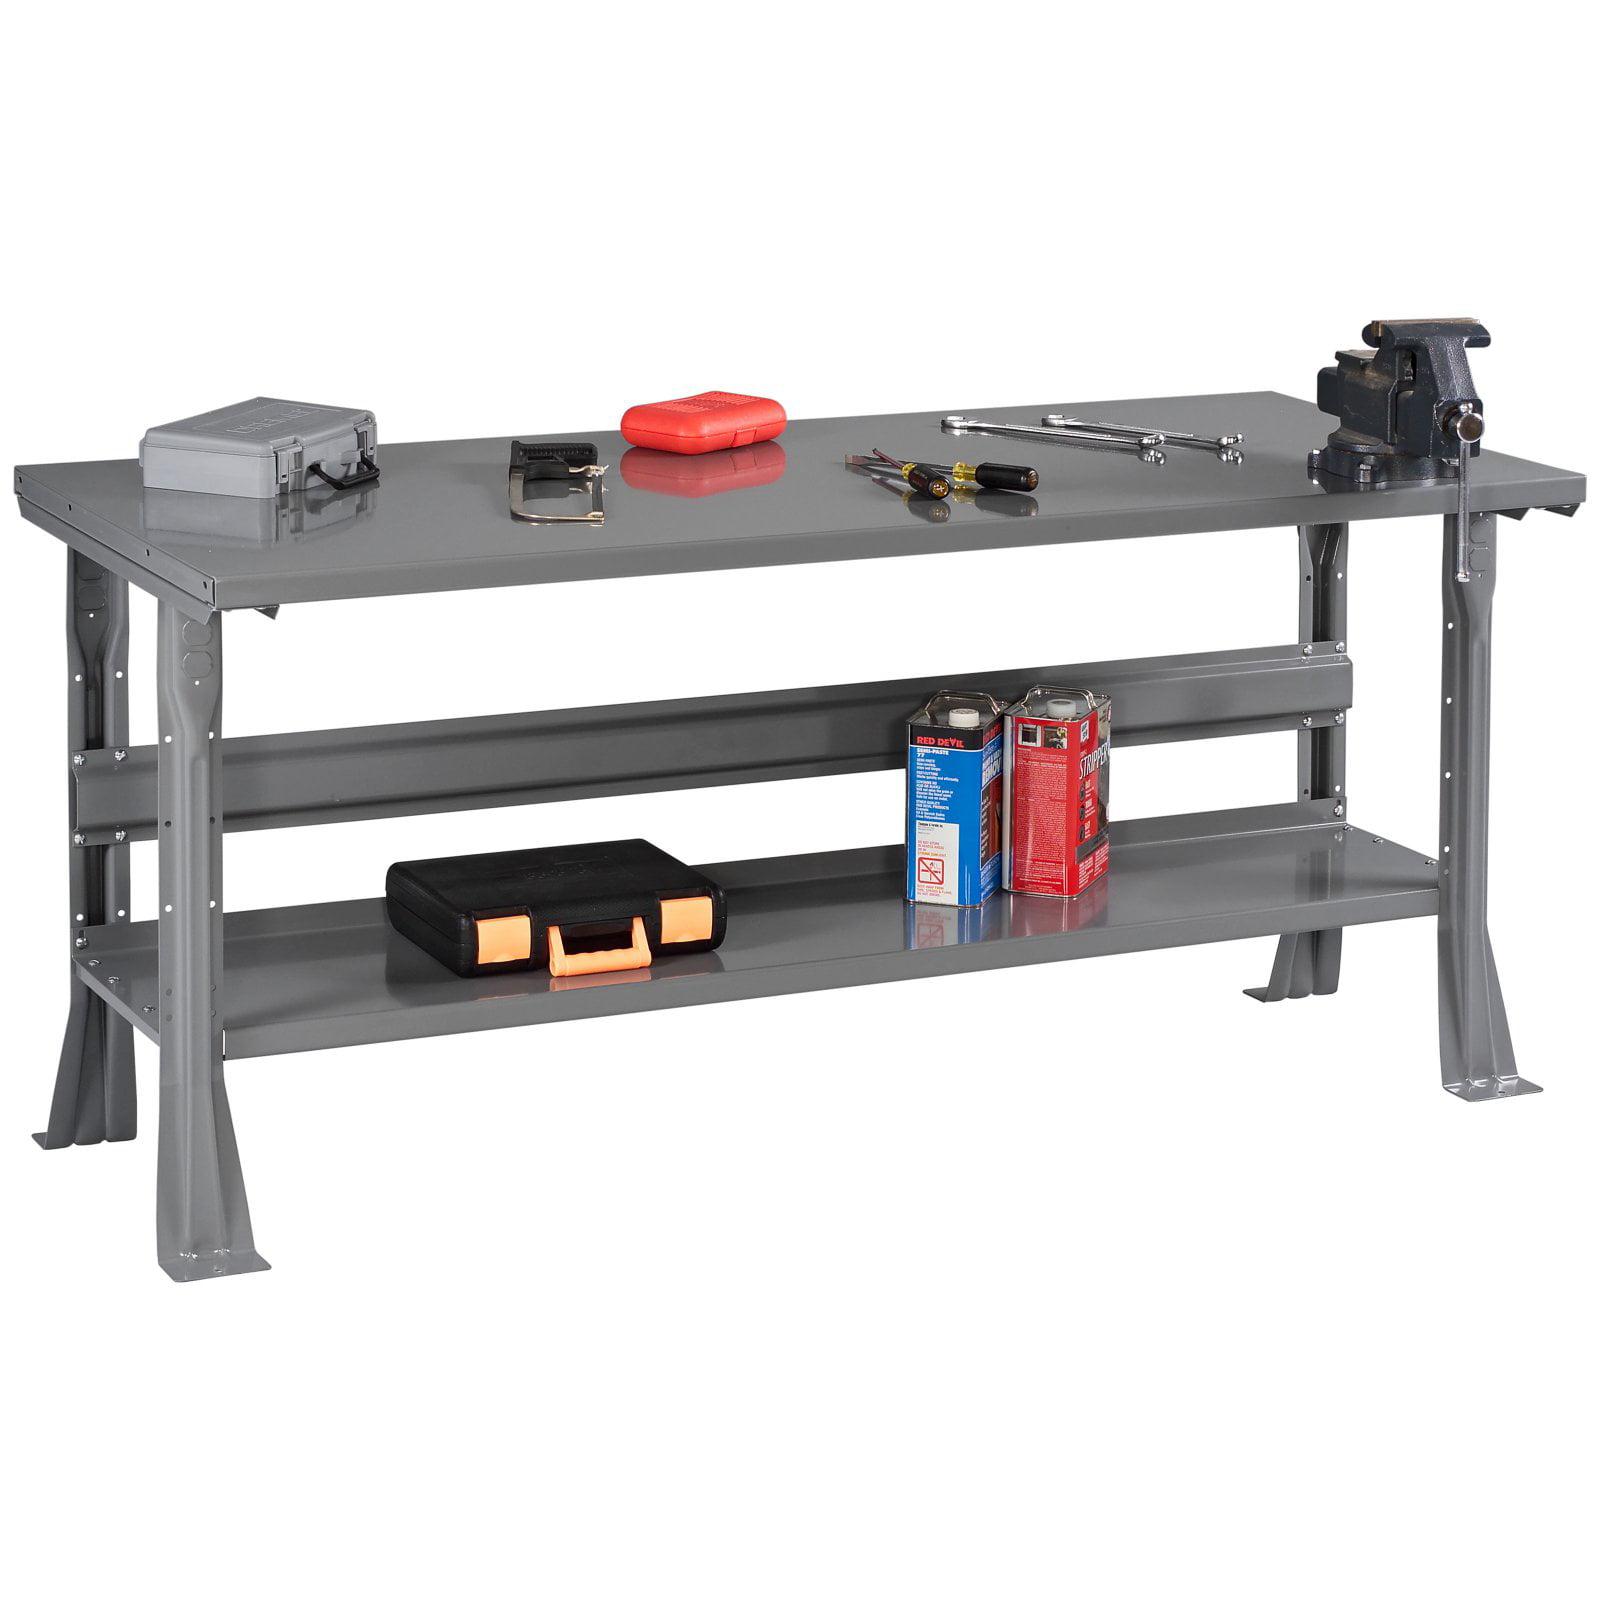 Tennsco Steel Top Workbench by Tennsco Corp